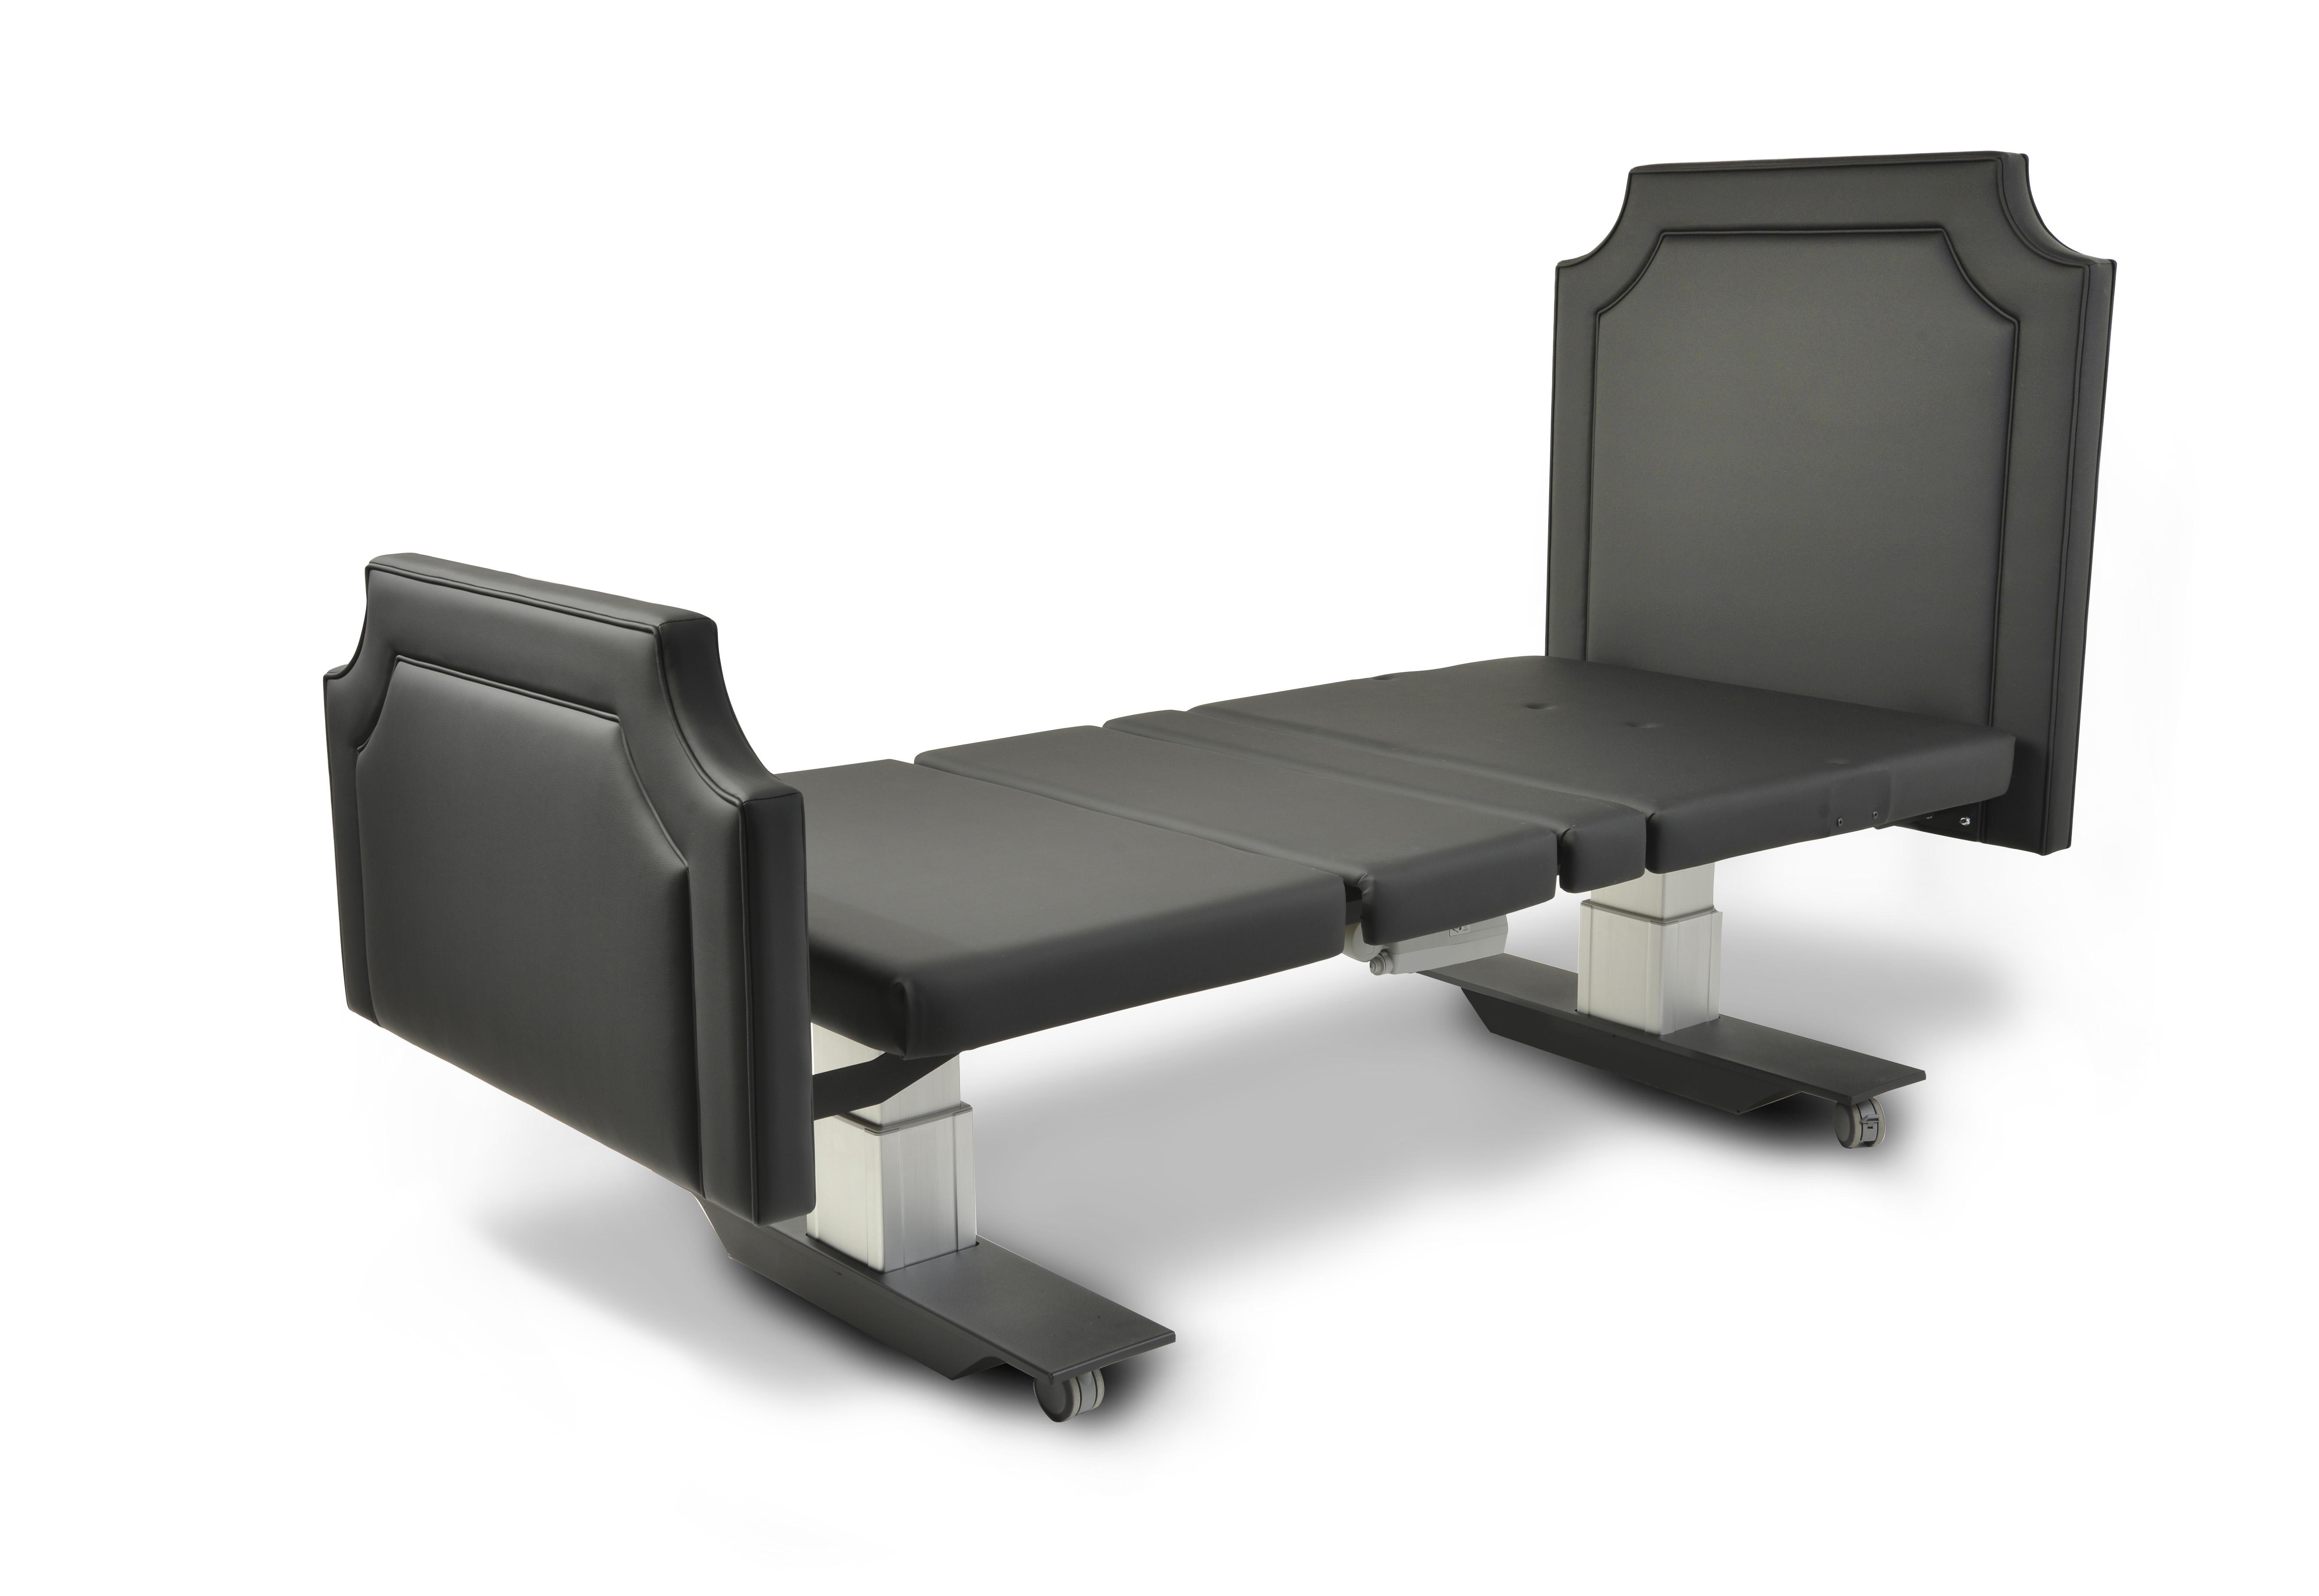 Assured Comfort Hi Low Adjustable Bed - Mobile Series - Fabric - Up Position